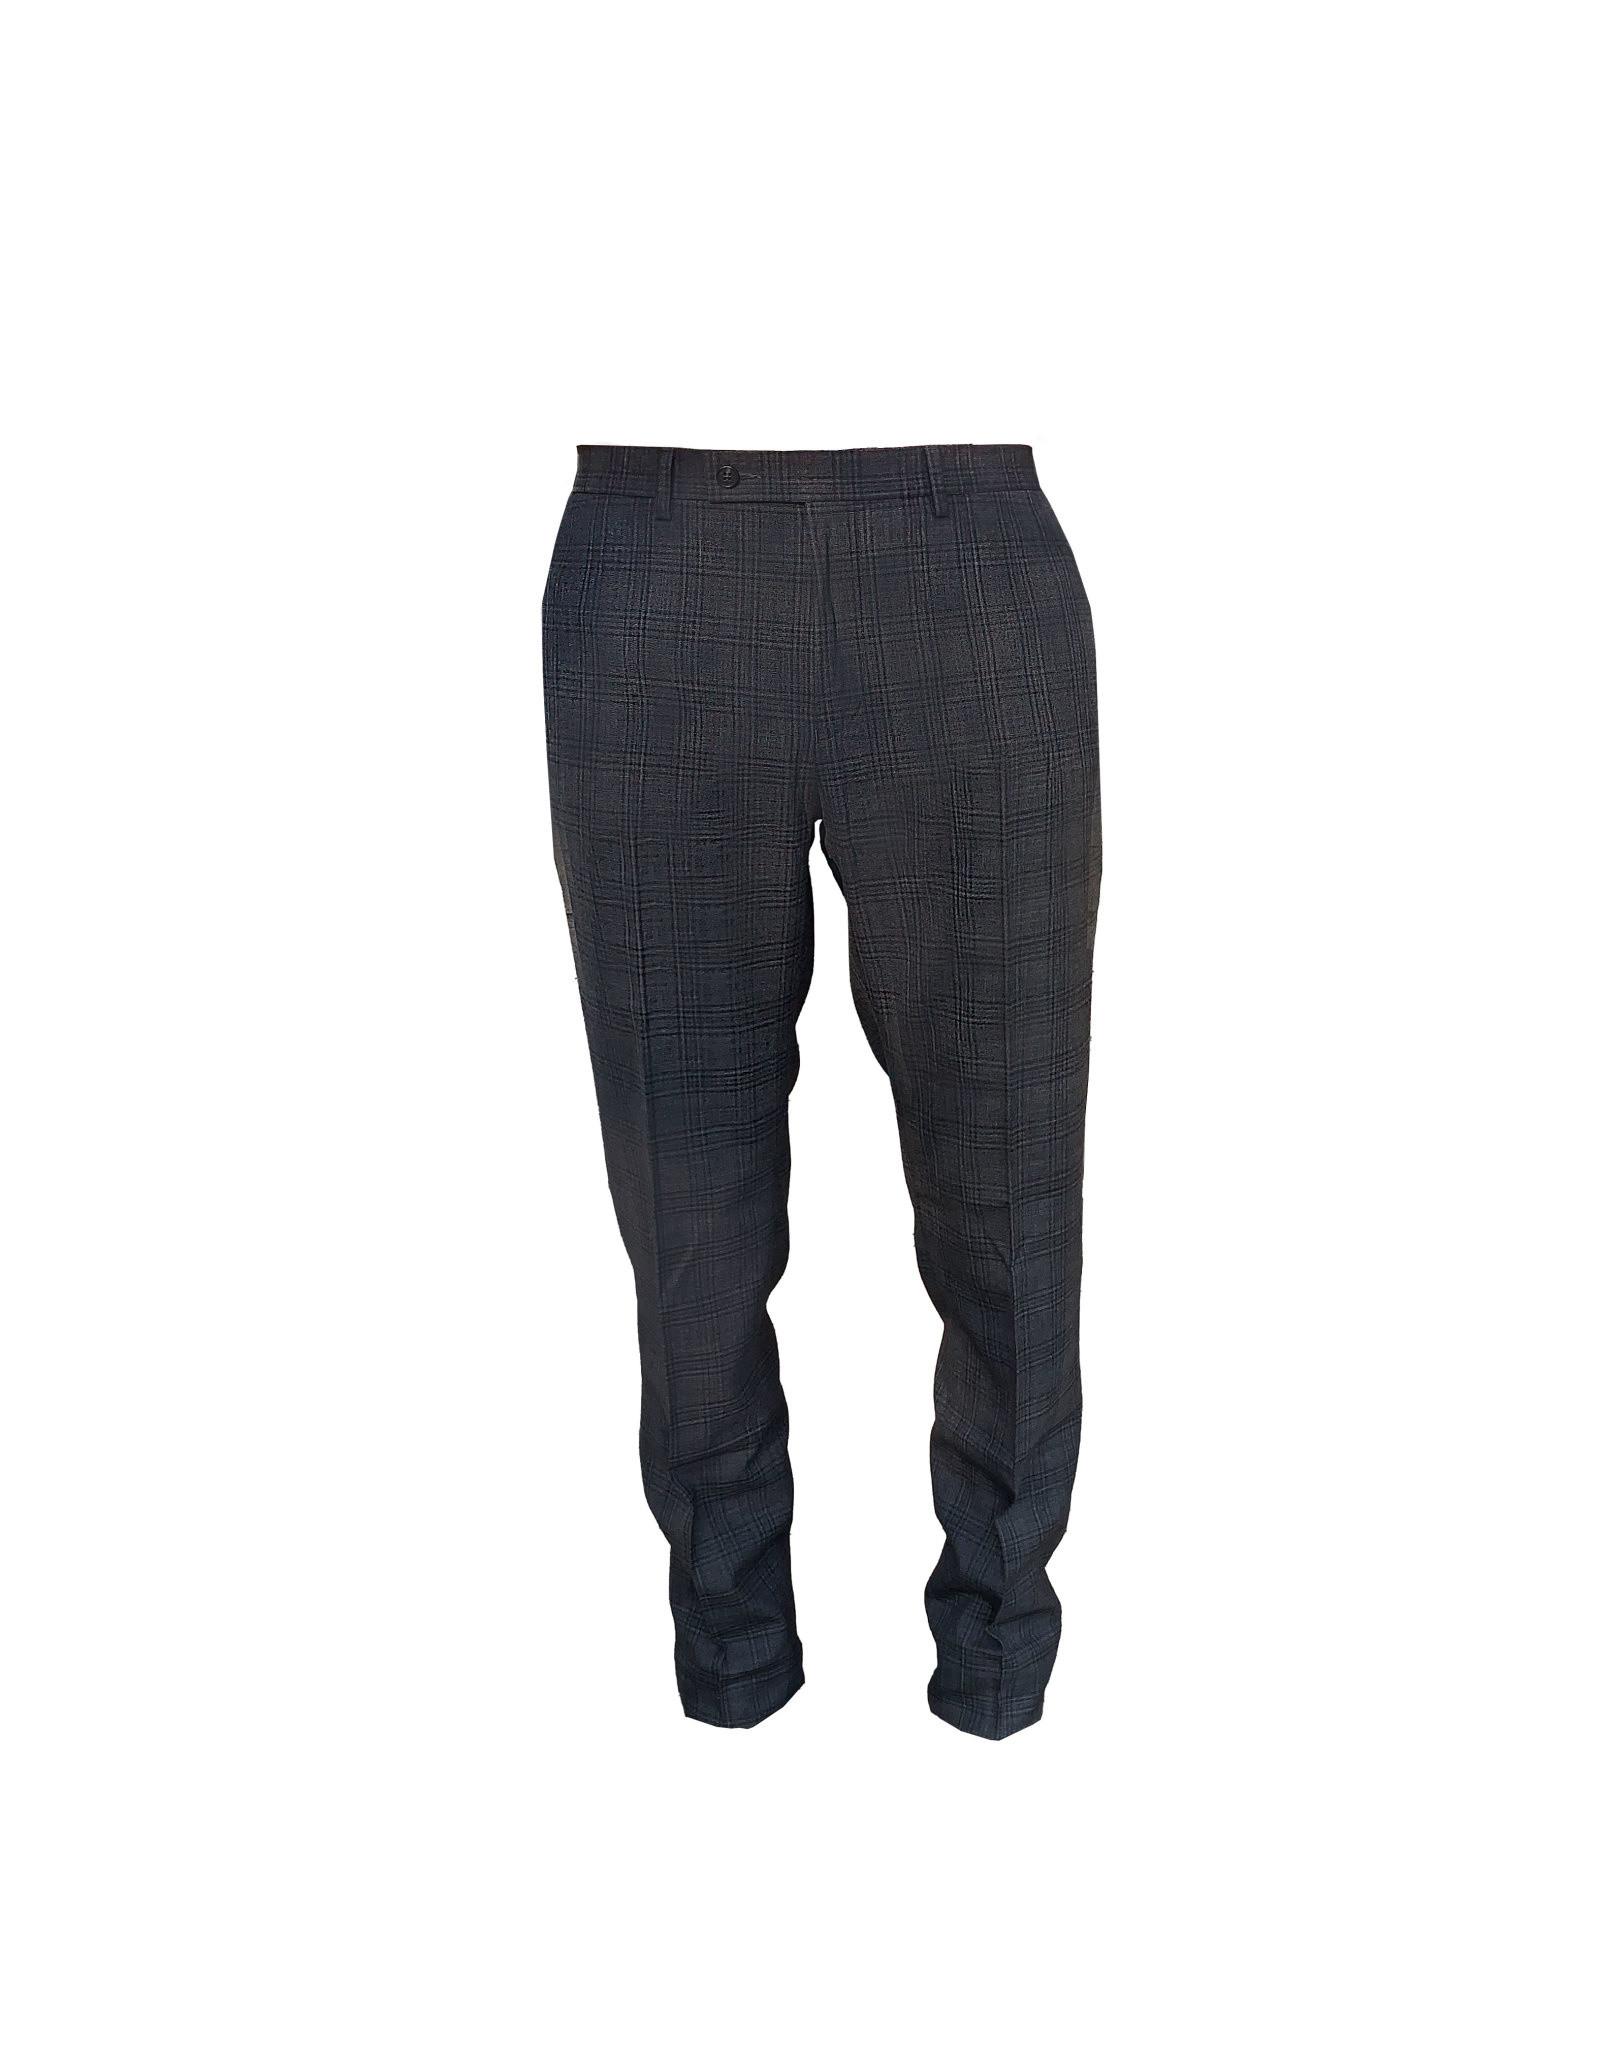 Calvin Klein CALVIN KLEIN  MEN'S Pants  Size 40 Long 33 W